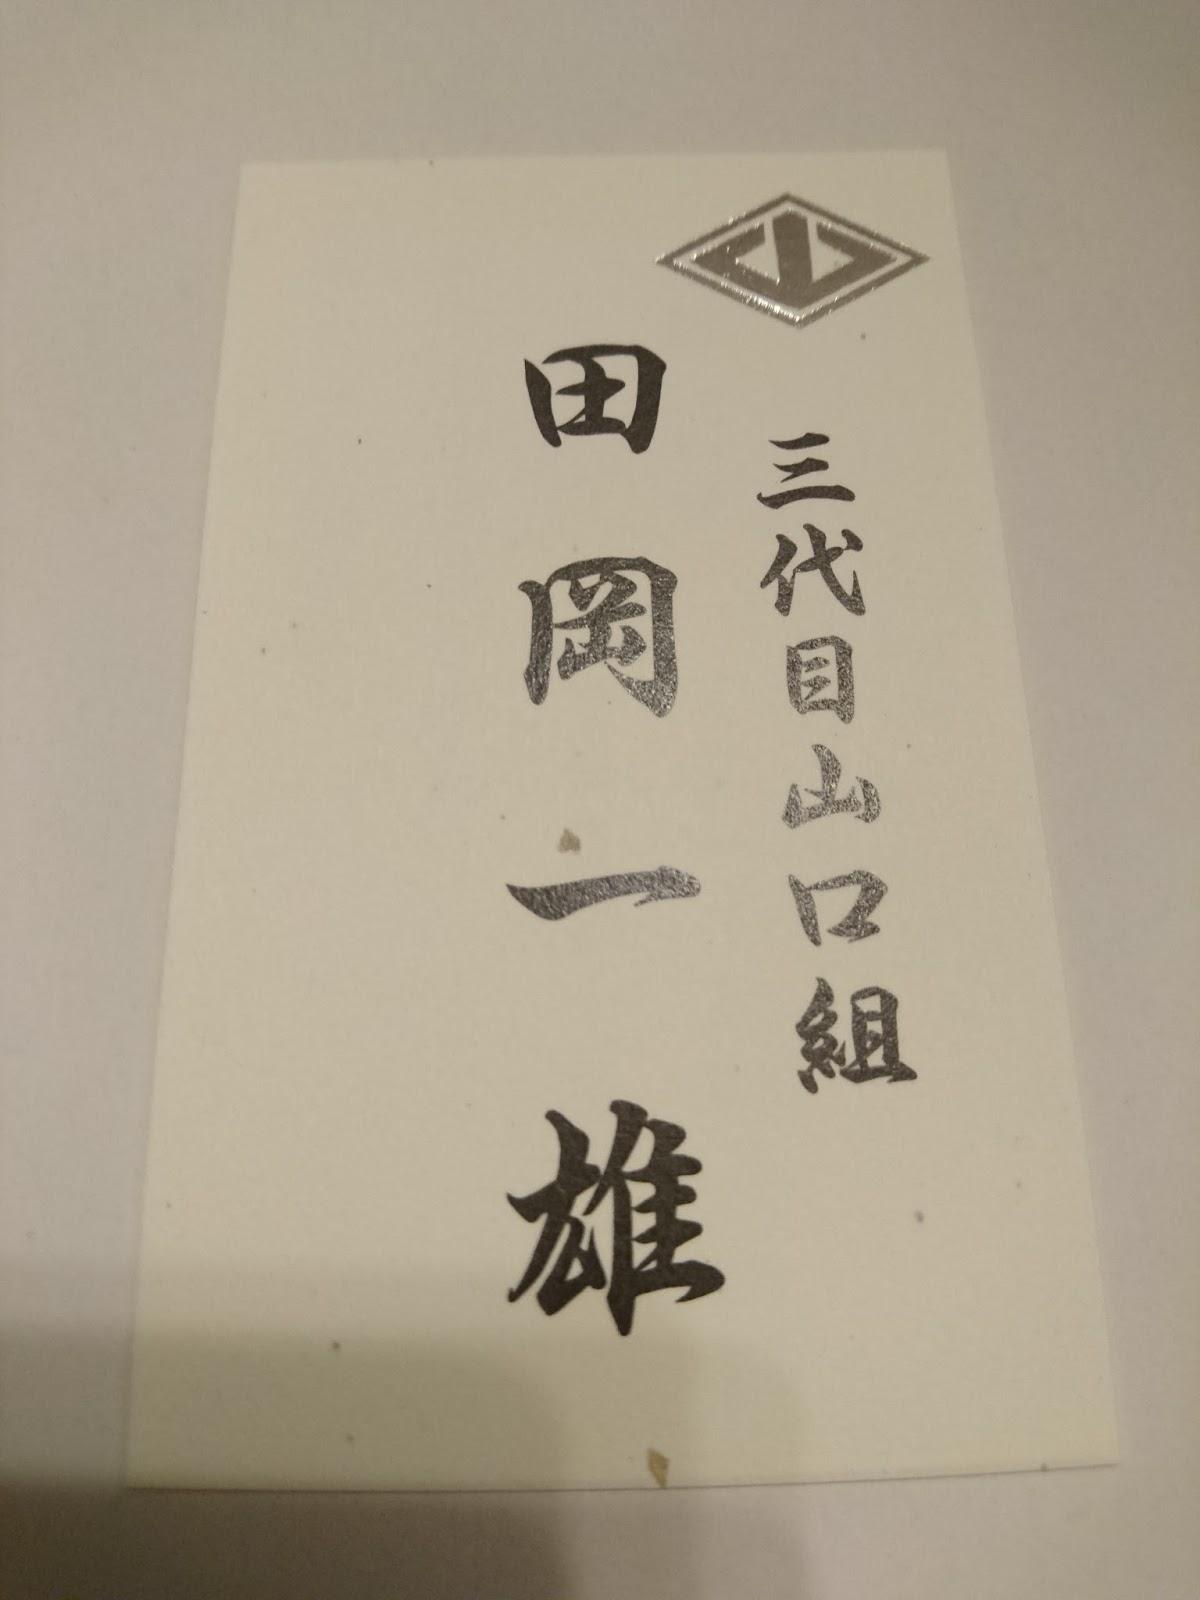 【ヤクザ動画】山口組直参組長の名刺